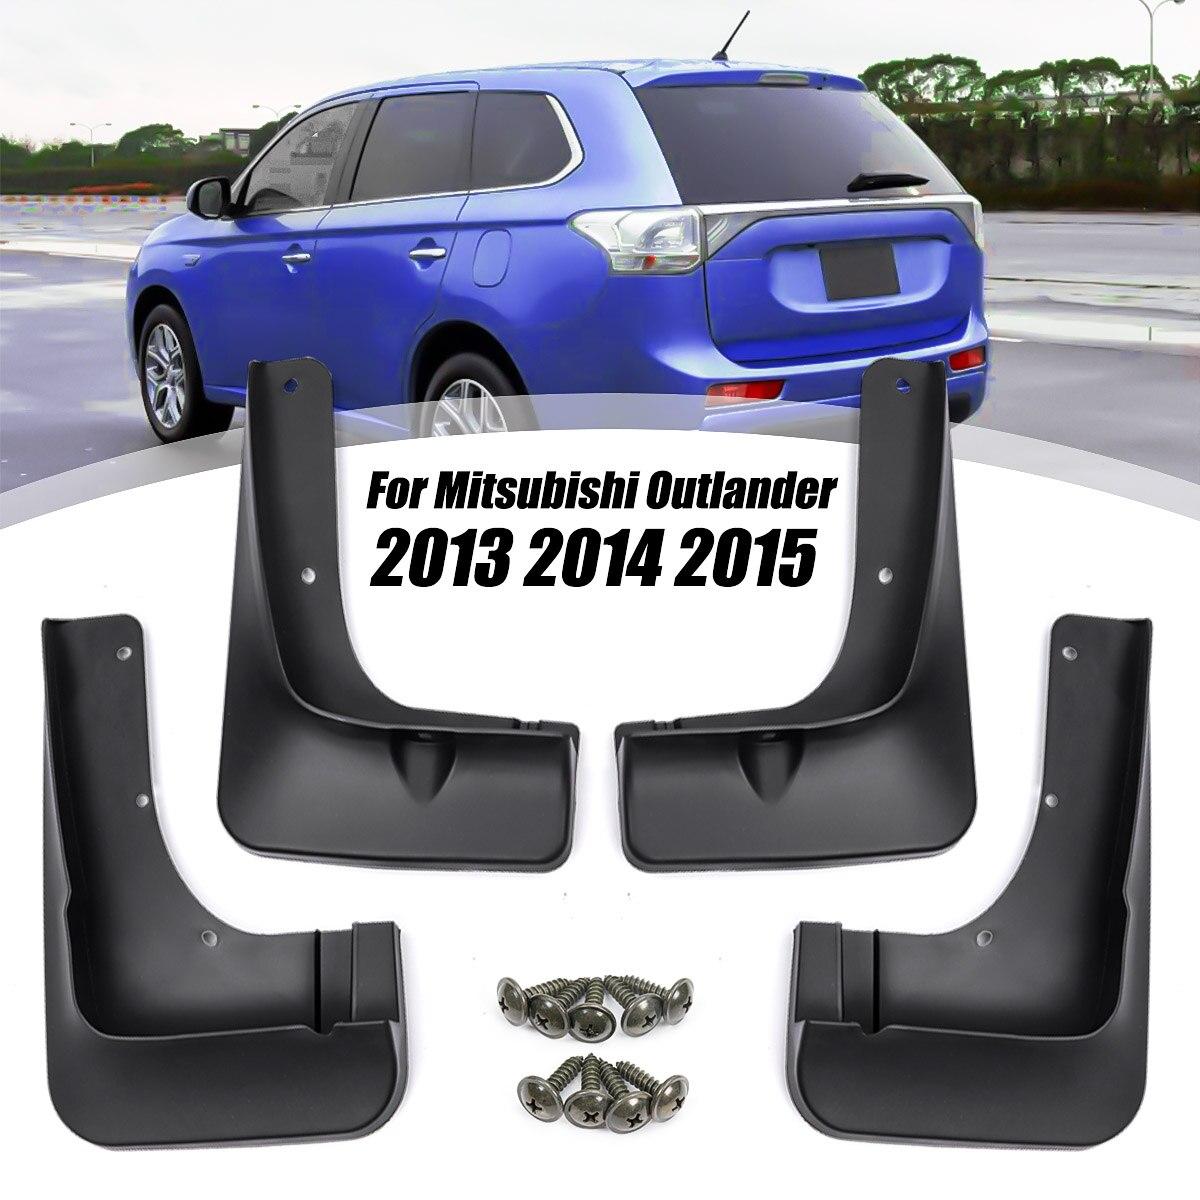 4 Mud Flaps Splash Guard Fender Car Mudguard forMitsubishi Outlander 2013-2015